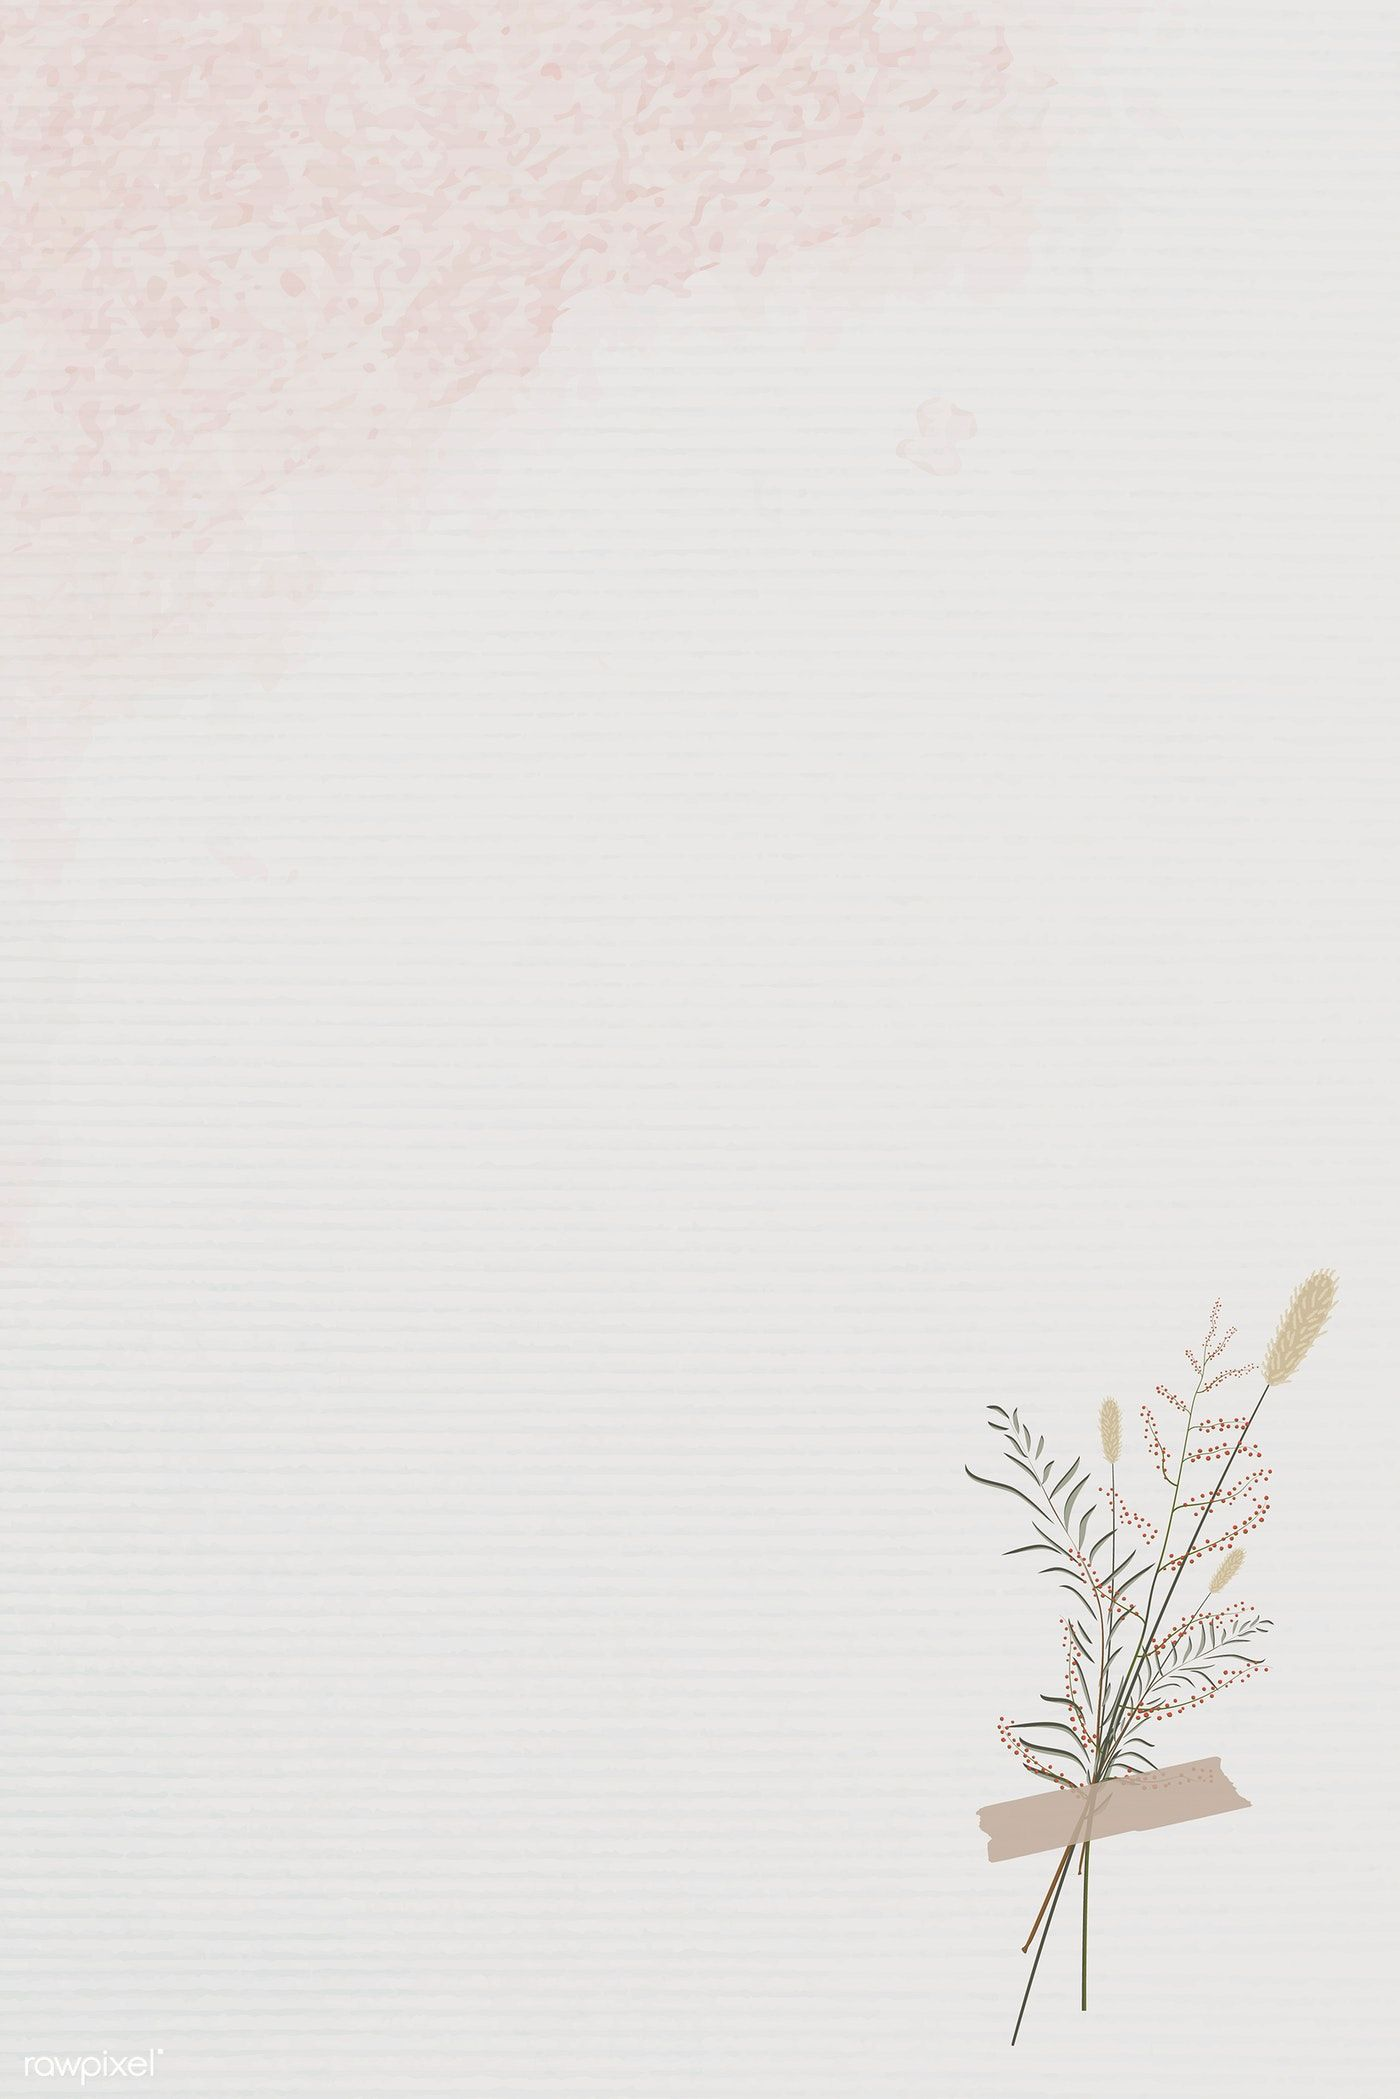 Download Premium Vector Of Vintage Leaves Design Background Vector 1228922 In 2020 Flower Background Wallpaper Flower Backgrounds Paper Background Texture